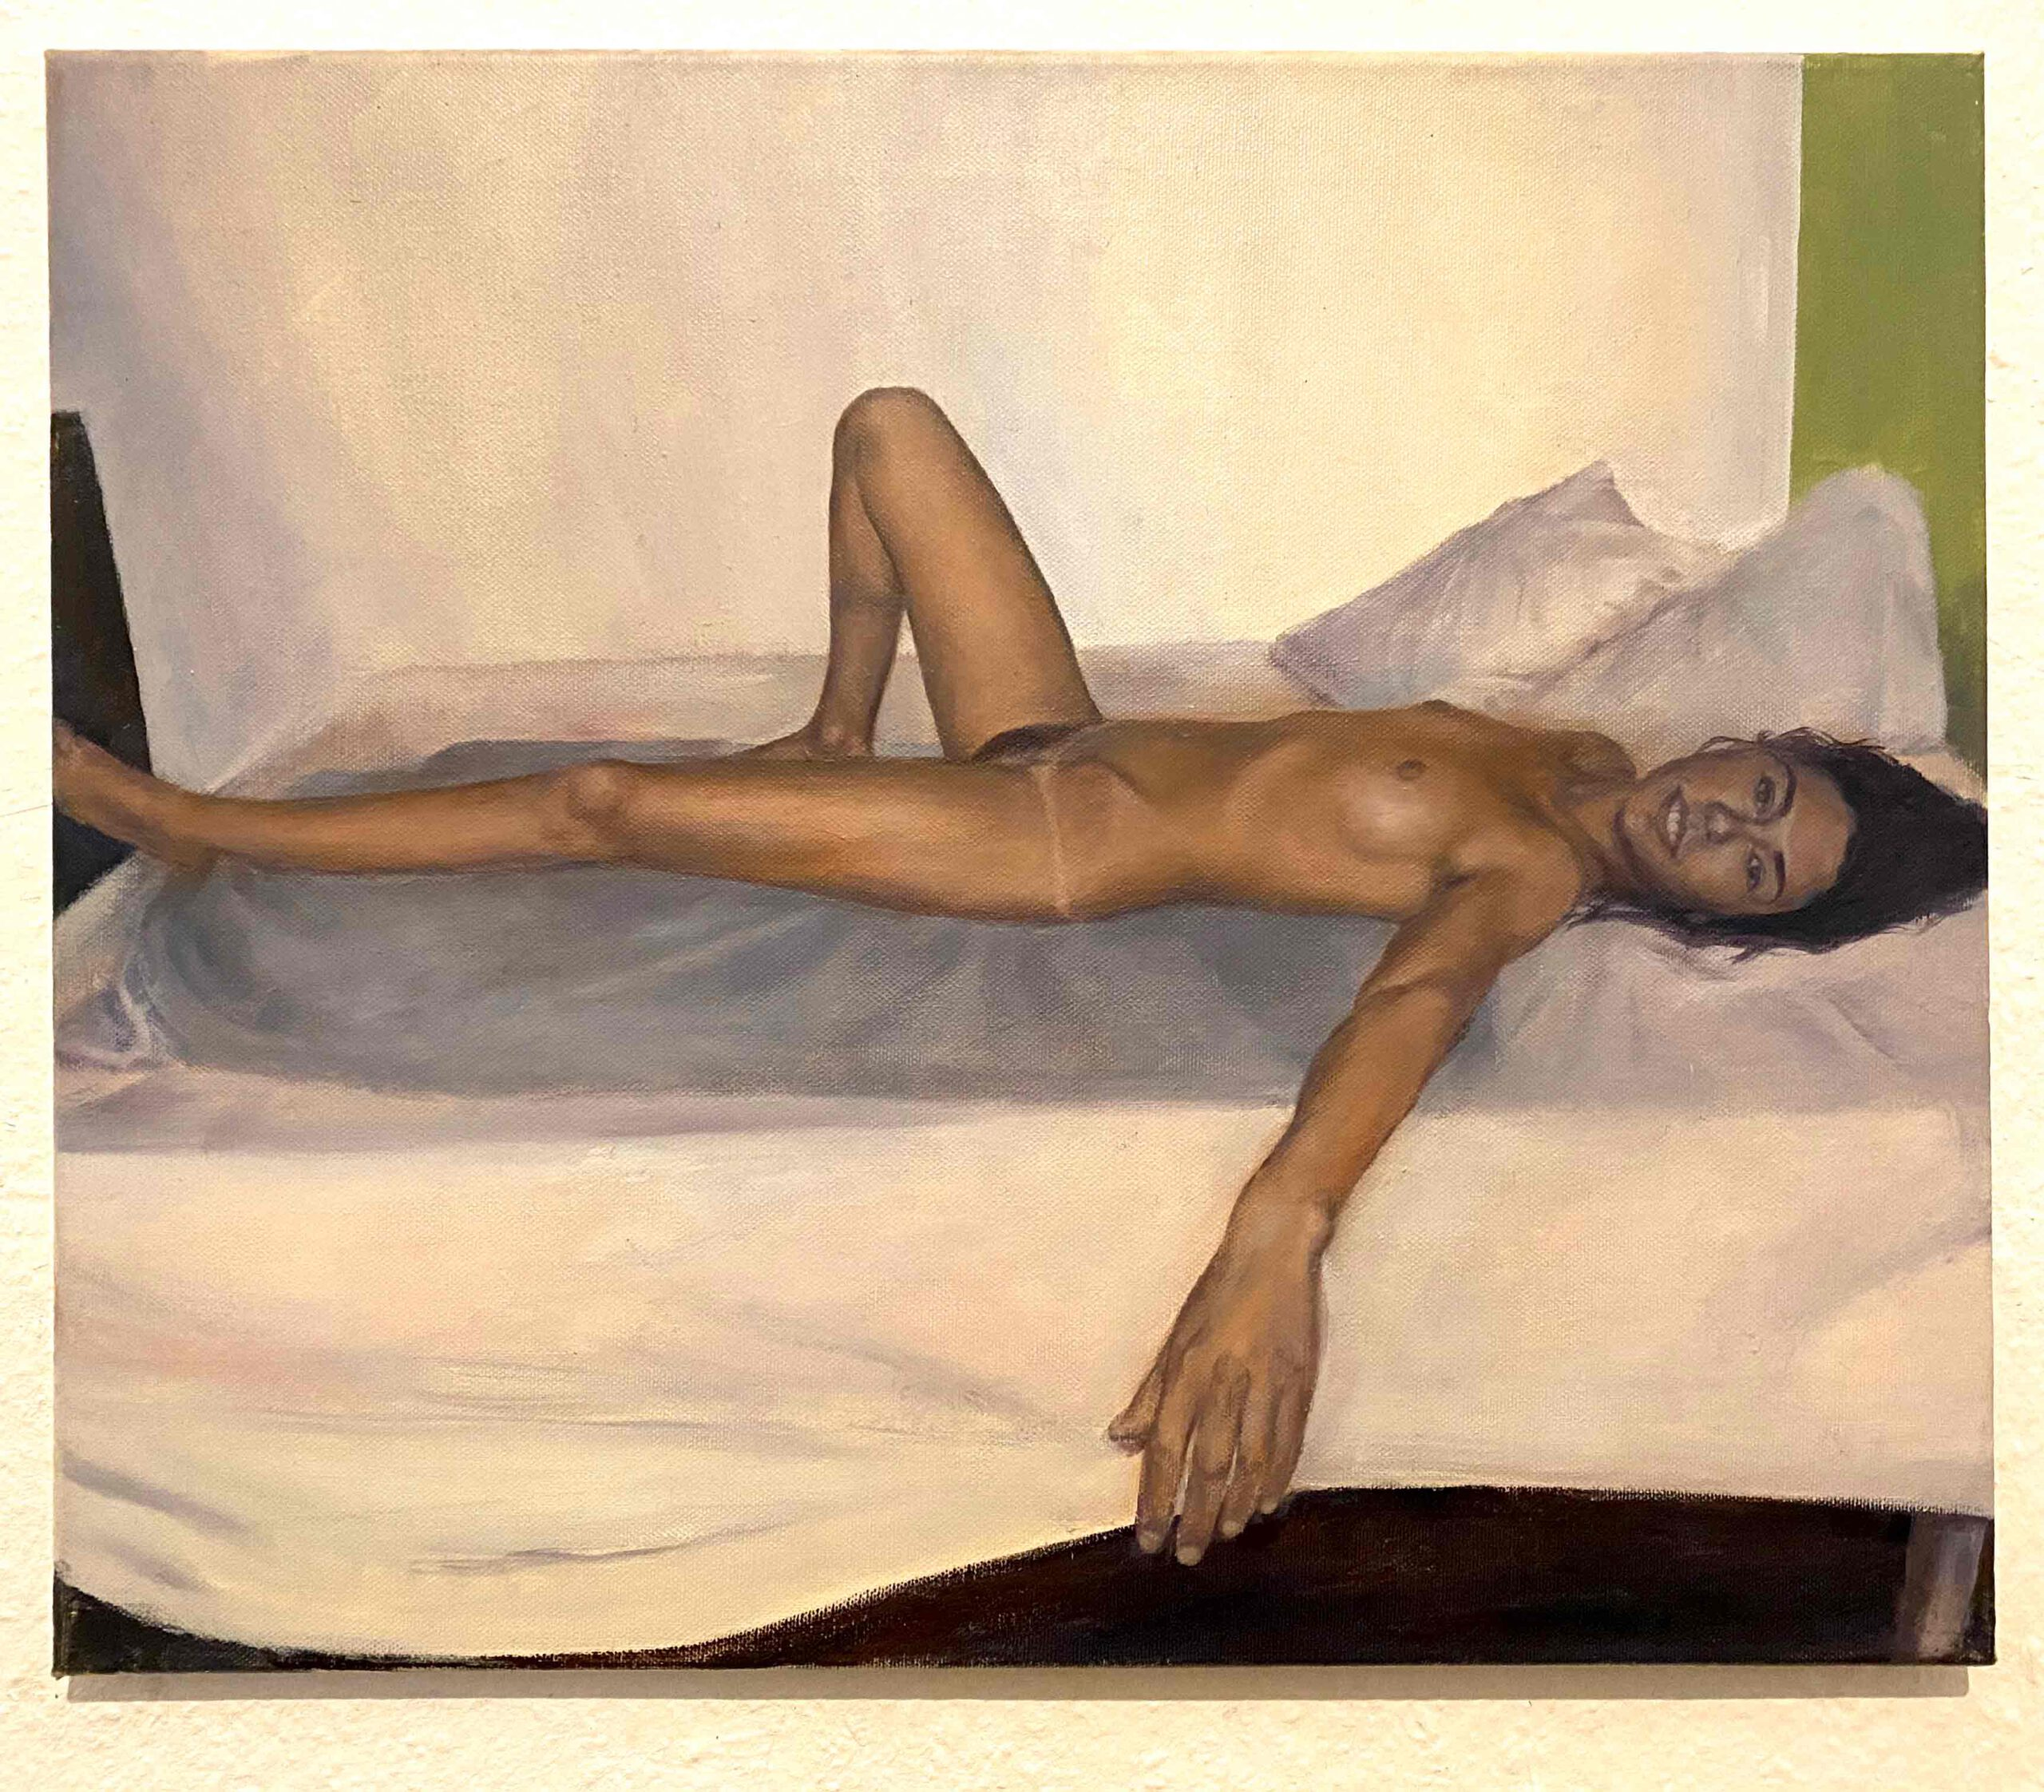 """Maria, BCN"" oil on canvas, 48 x 55 cm, Felix Rieger 2012"